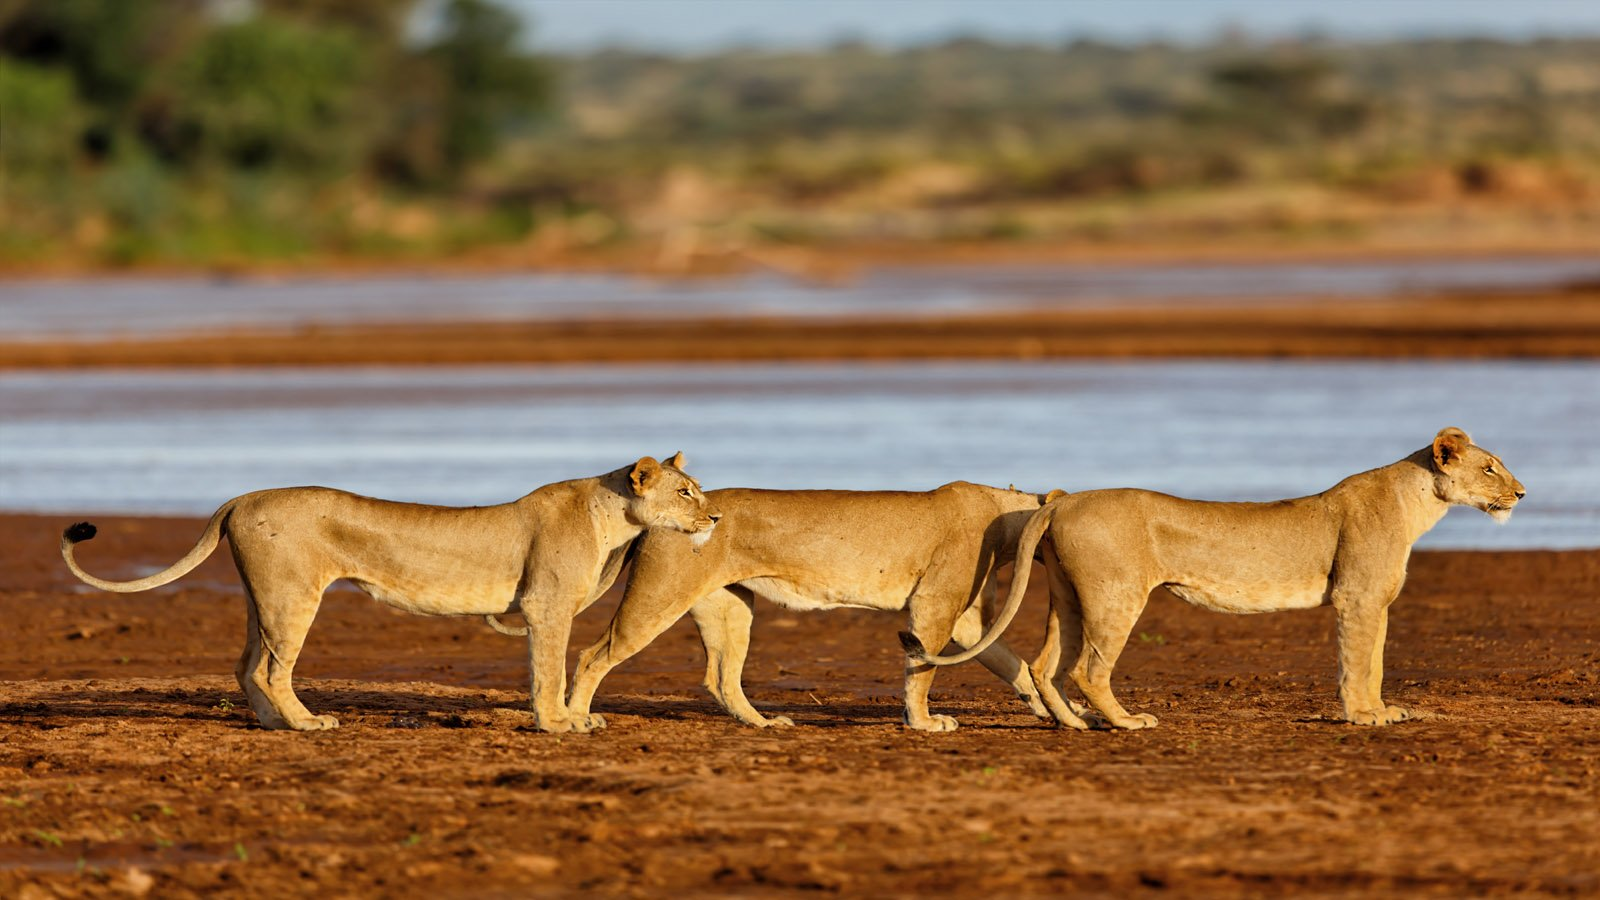 4 Days Wildlife Viewing in Masai Mara